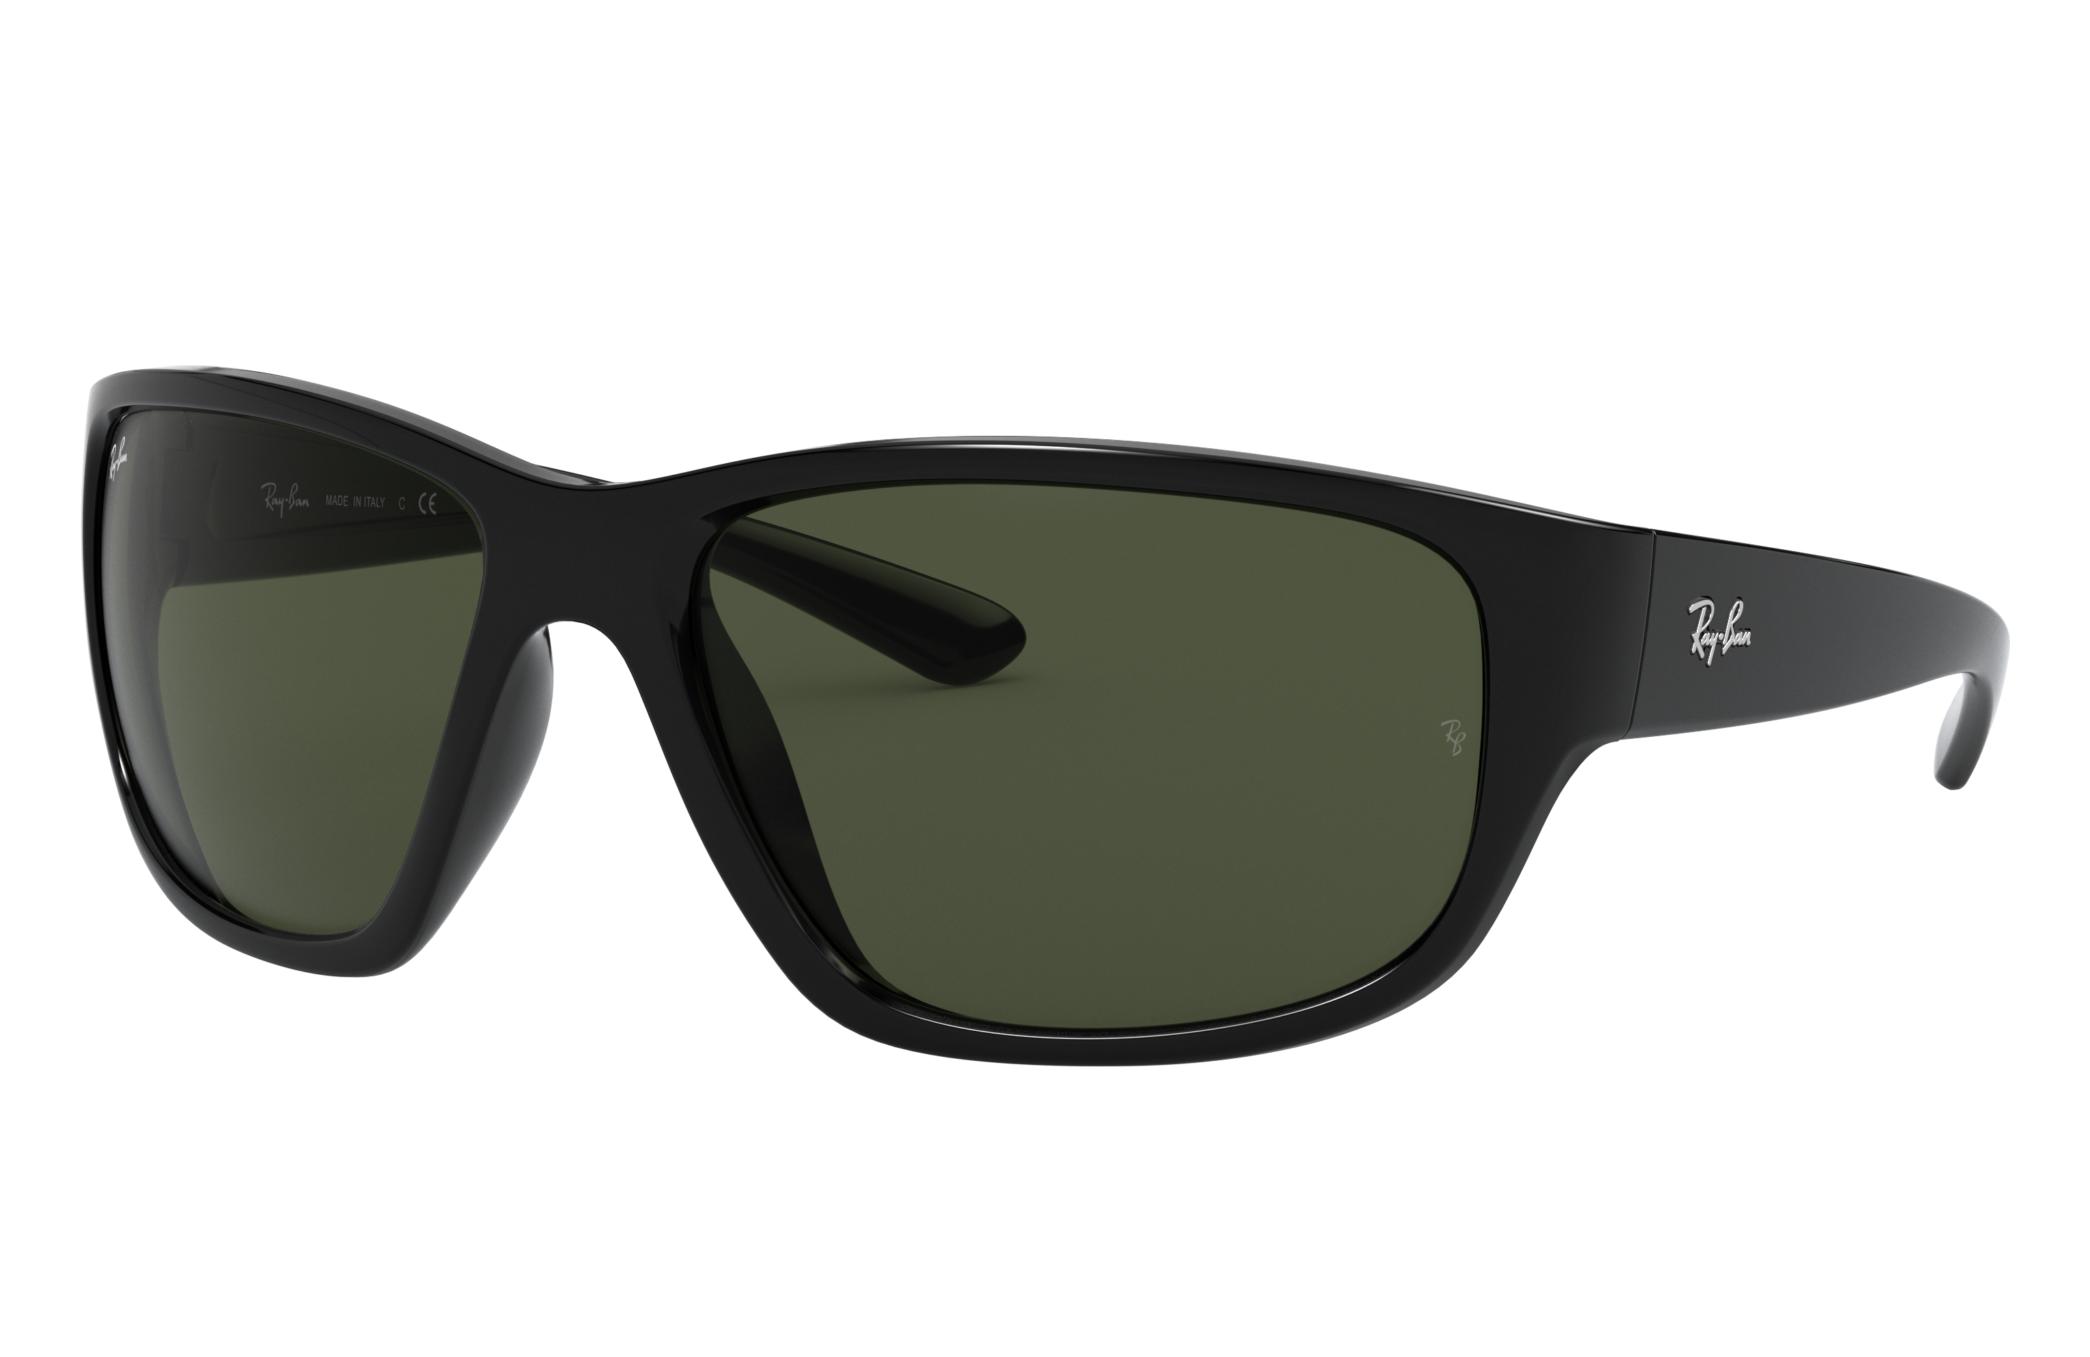 Ray-Ban Rb4300 Black, Green Lenses - RB4300